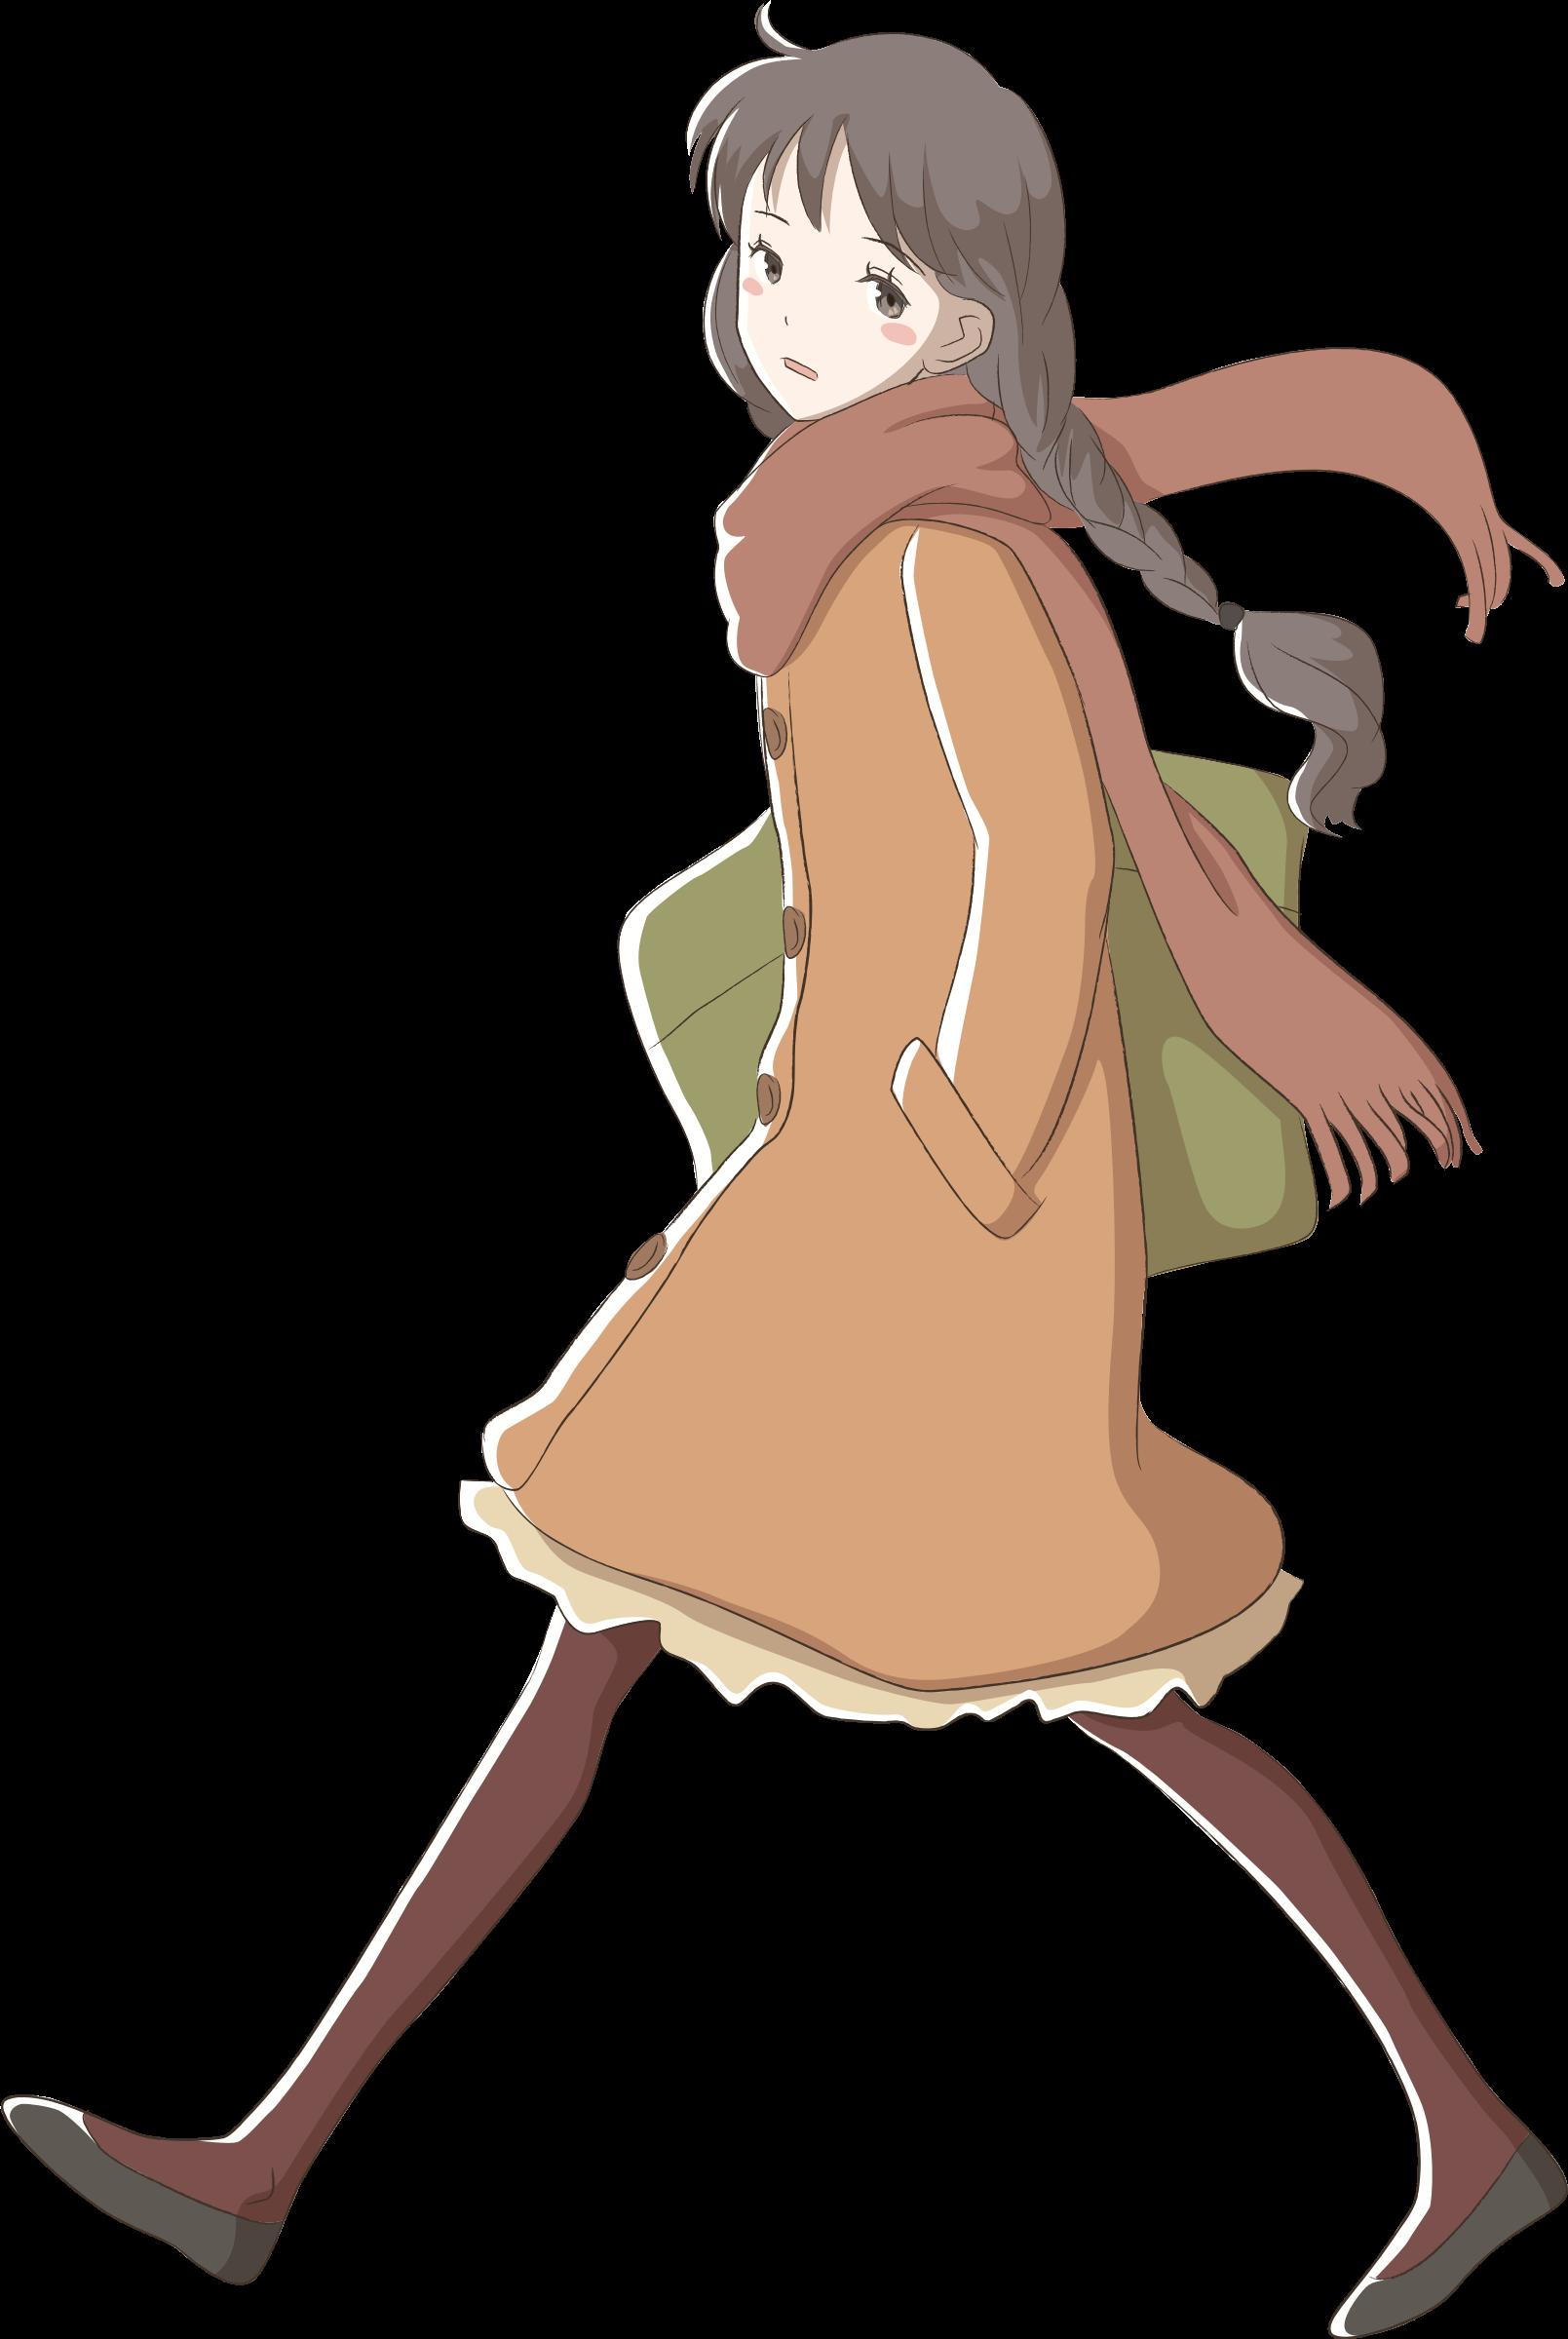 Clipart Girl Walking